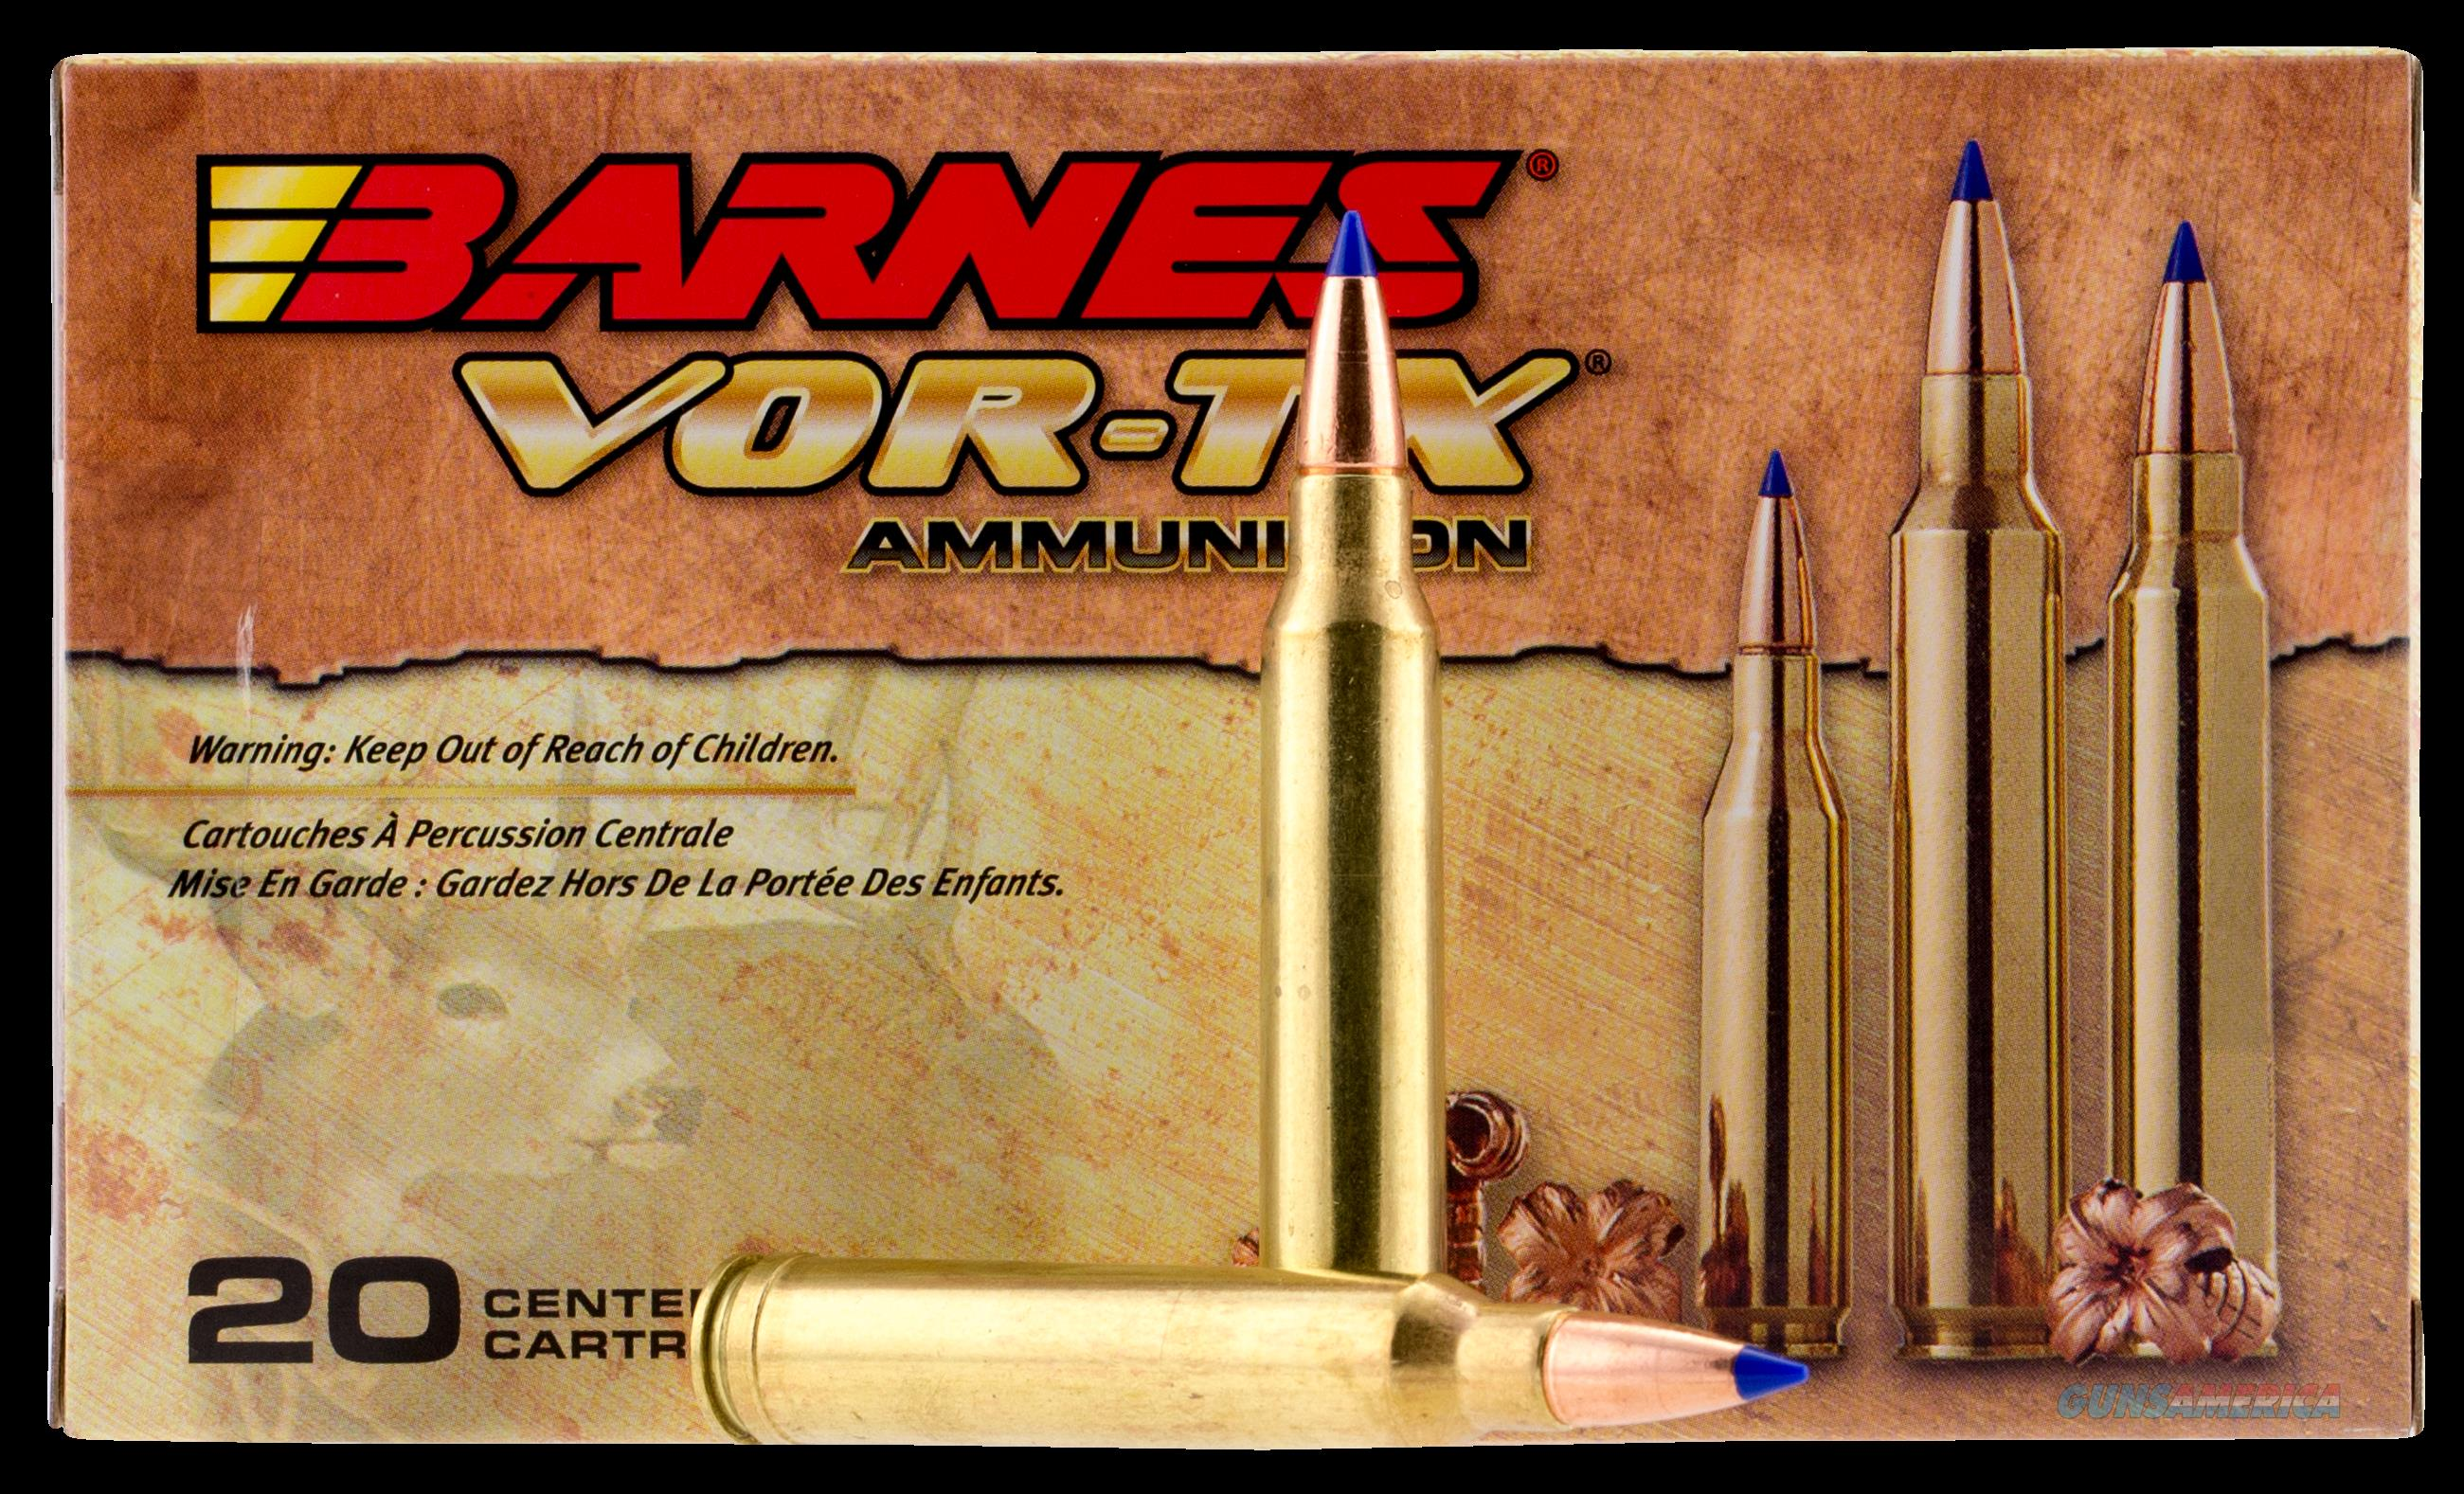 Barnes Bullets Vor-tx Rifle, Brns 30816 Bb308w3     308       130 Ttsx Bt 20-10  Guns > Pistols > 1911 Pistol Copies (non-Colt)